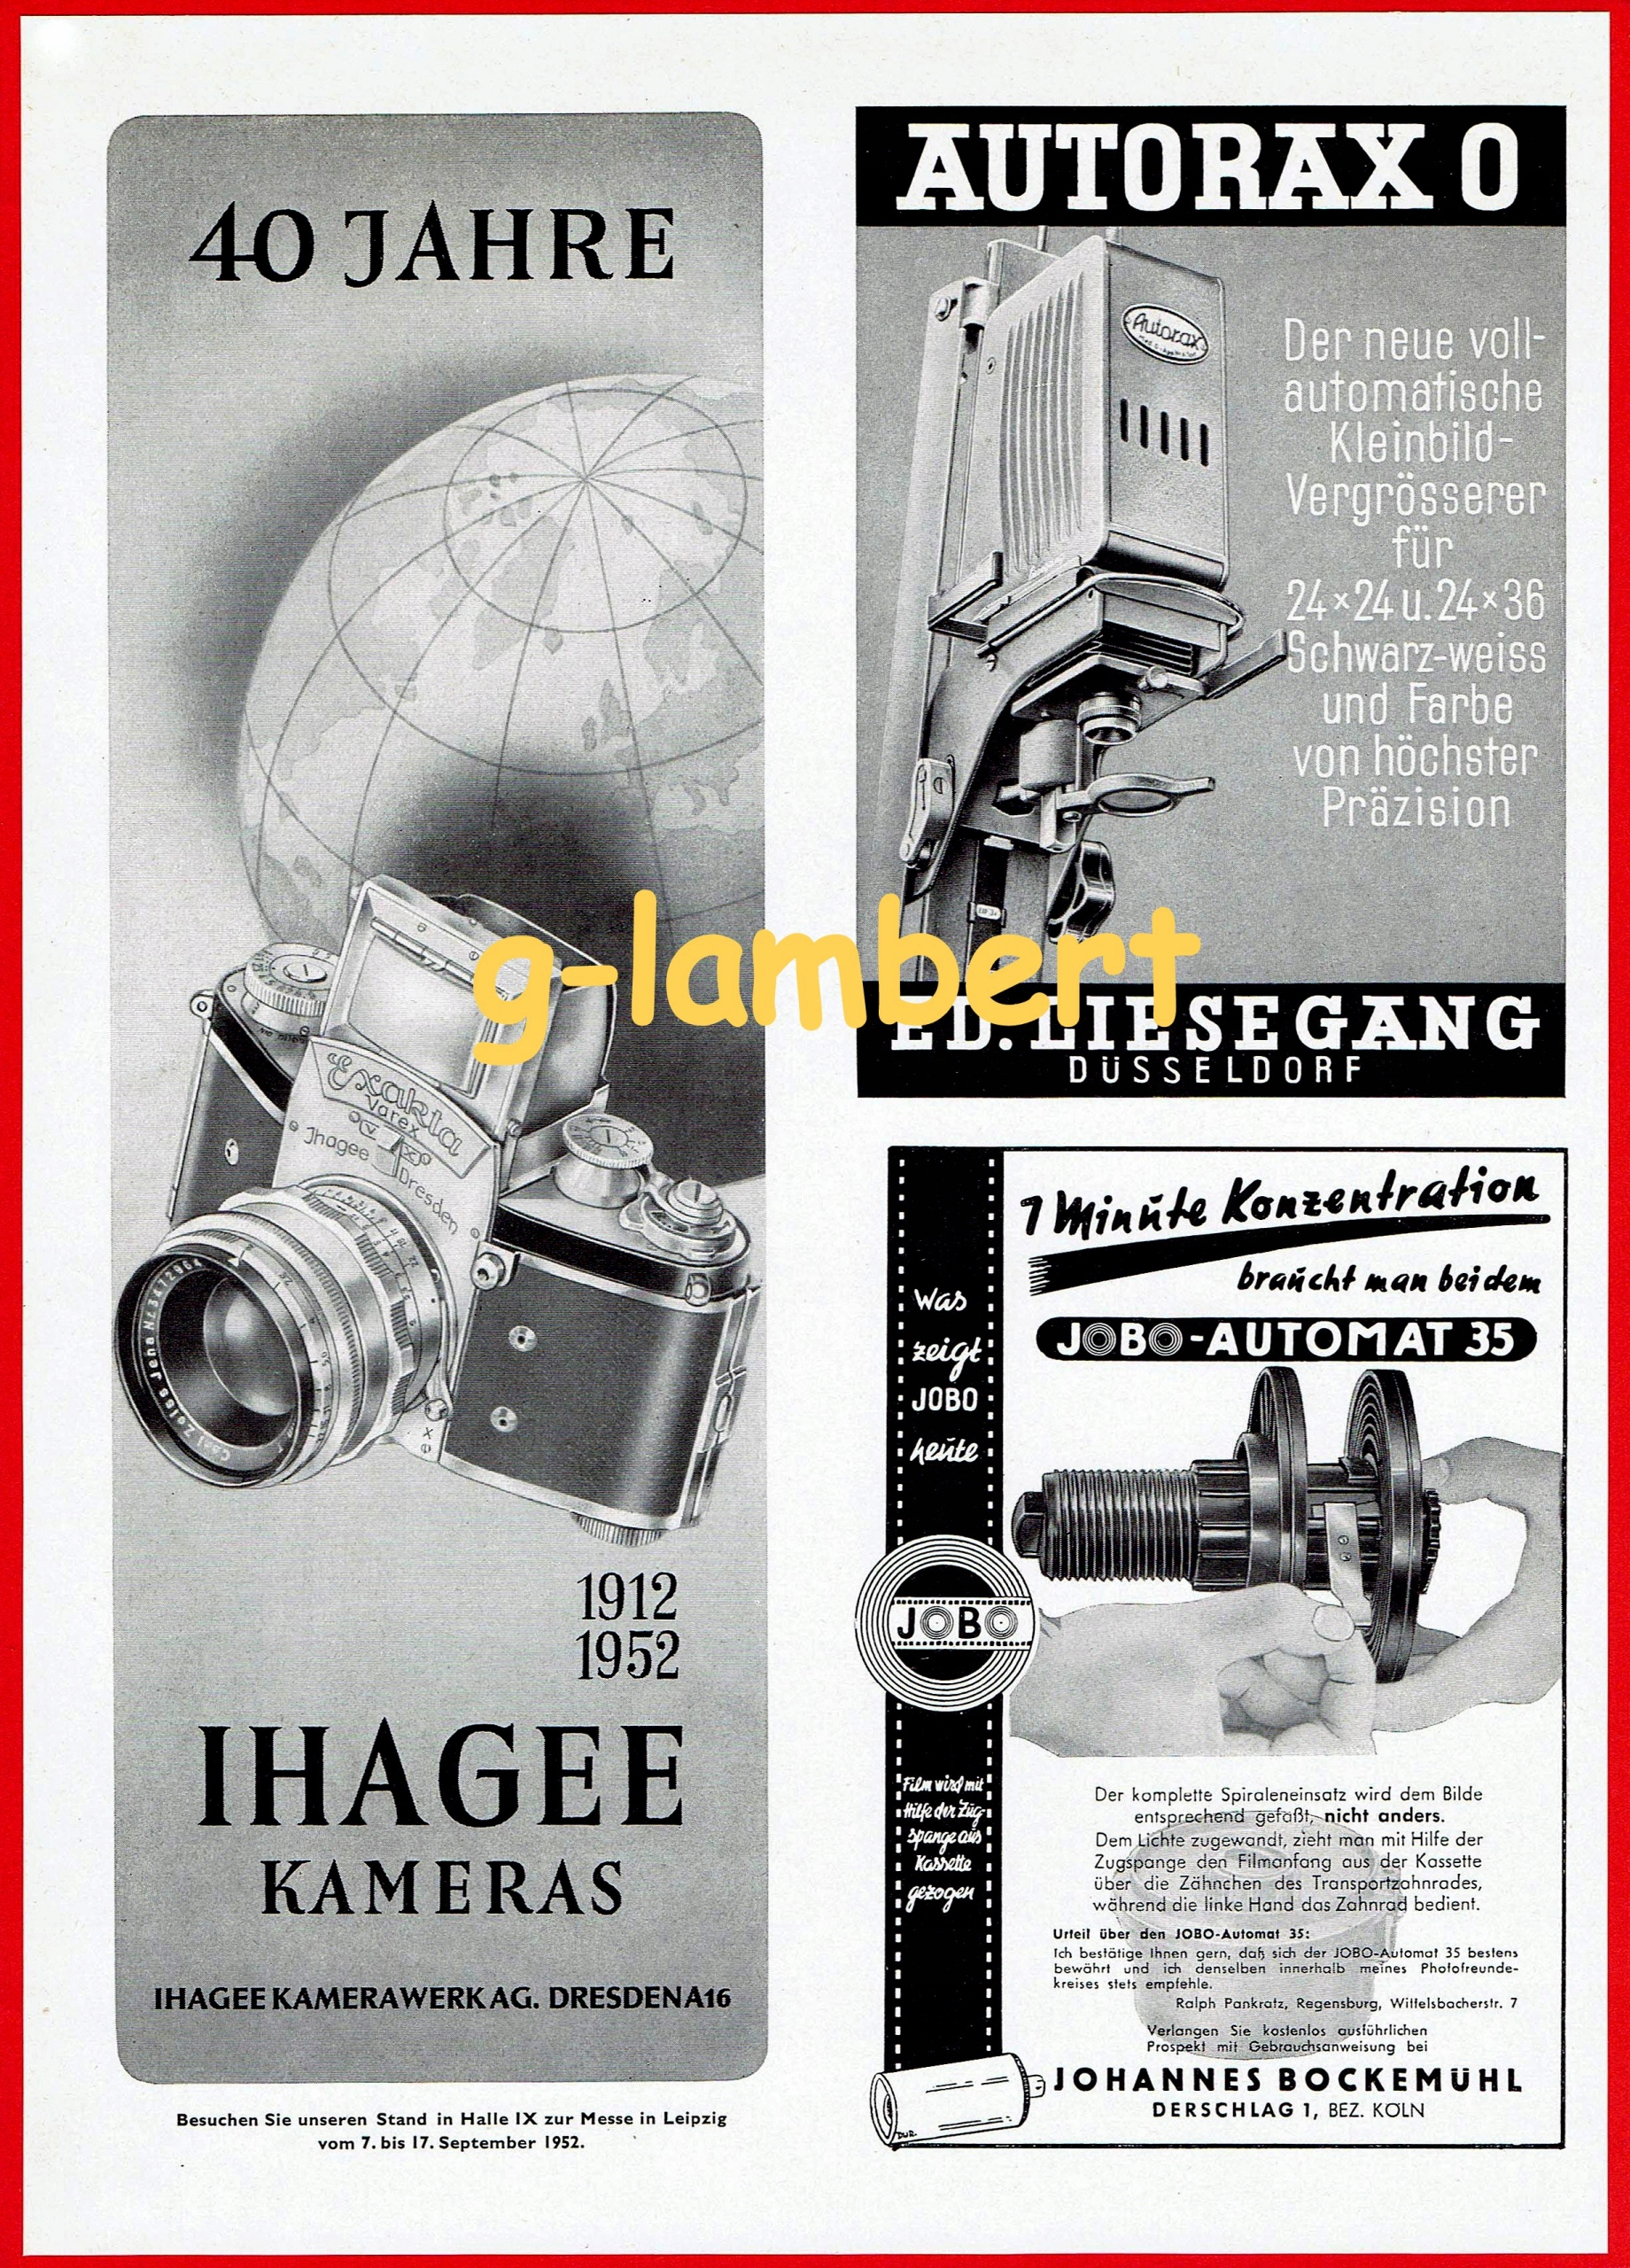 40 Jahre 1912-1952 Ihagee Kameras reklama prasowa